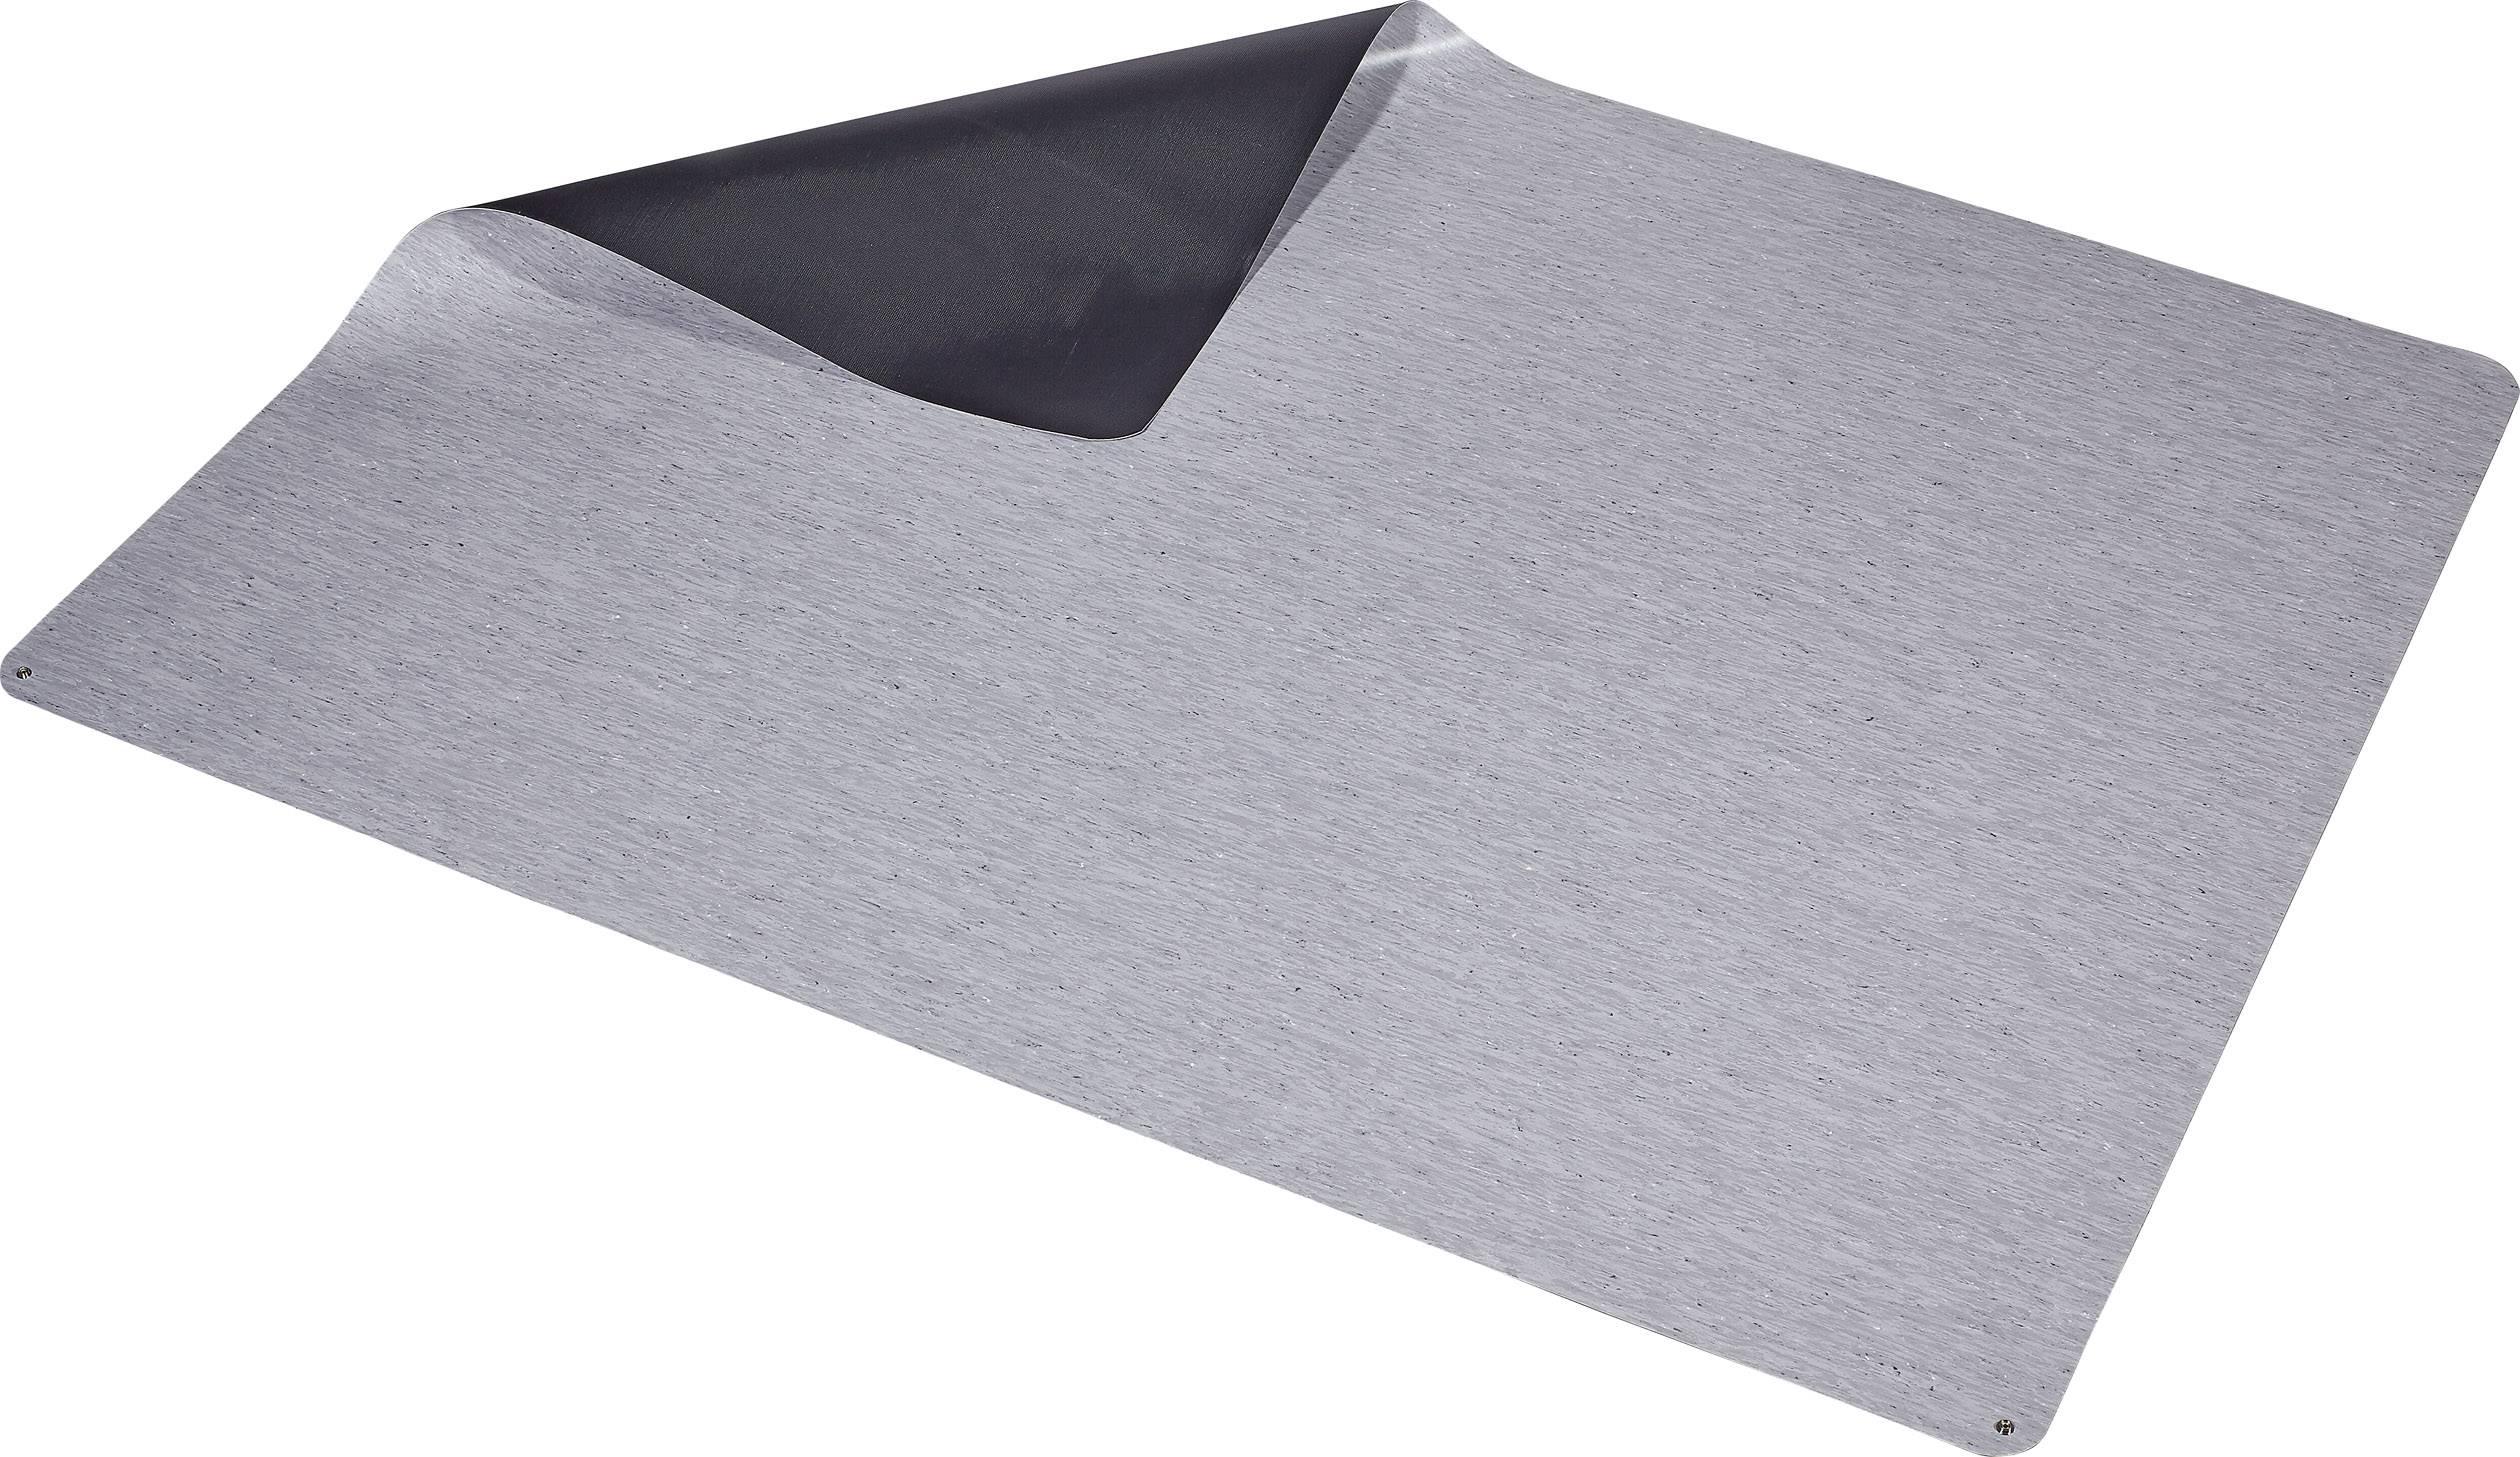 ESD podlahová rohož Wolfgang Warmbier 1250.47002.L, (d x š x v) 2000 x 1500 x 2 mm, sivá